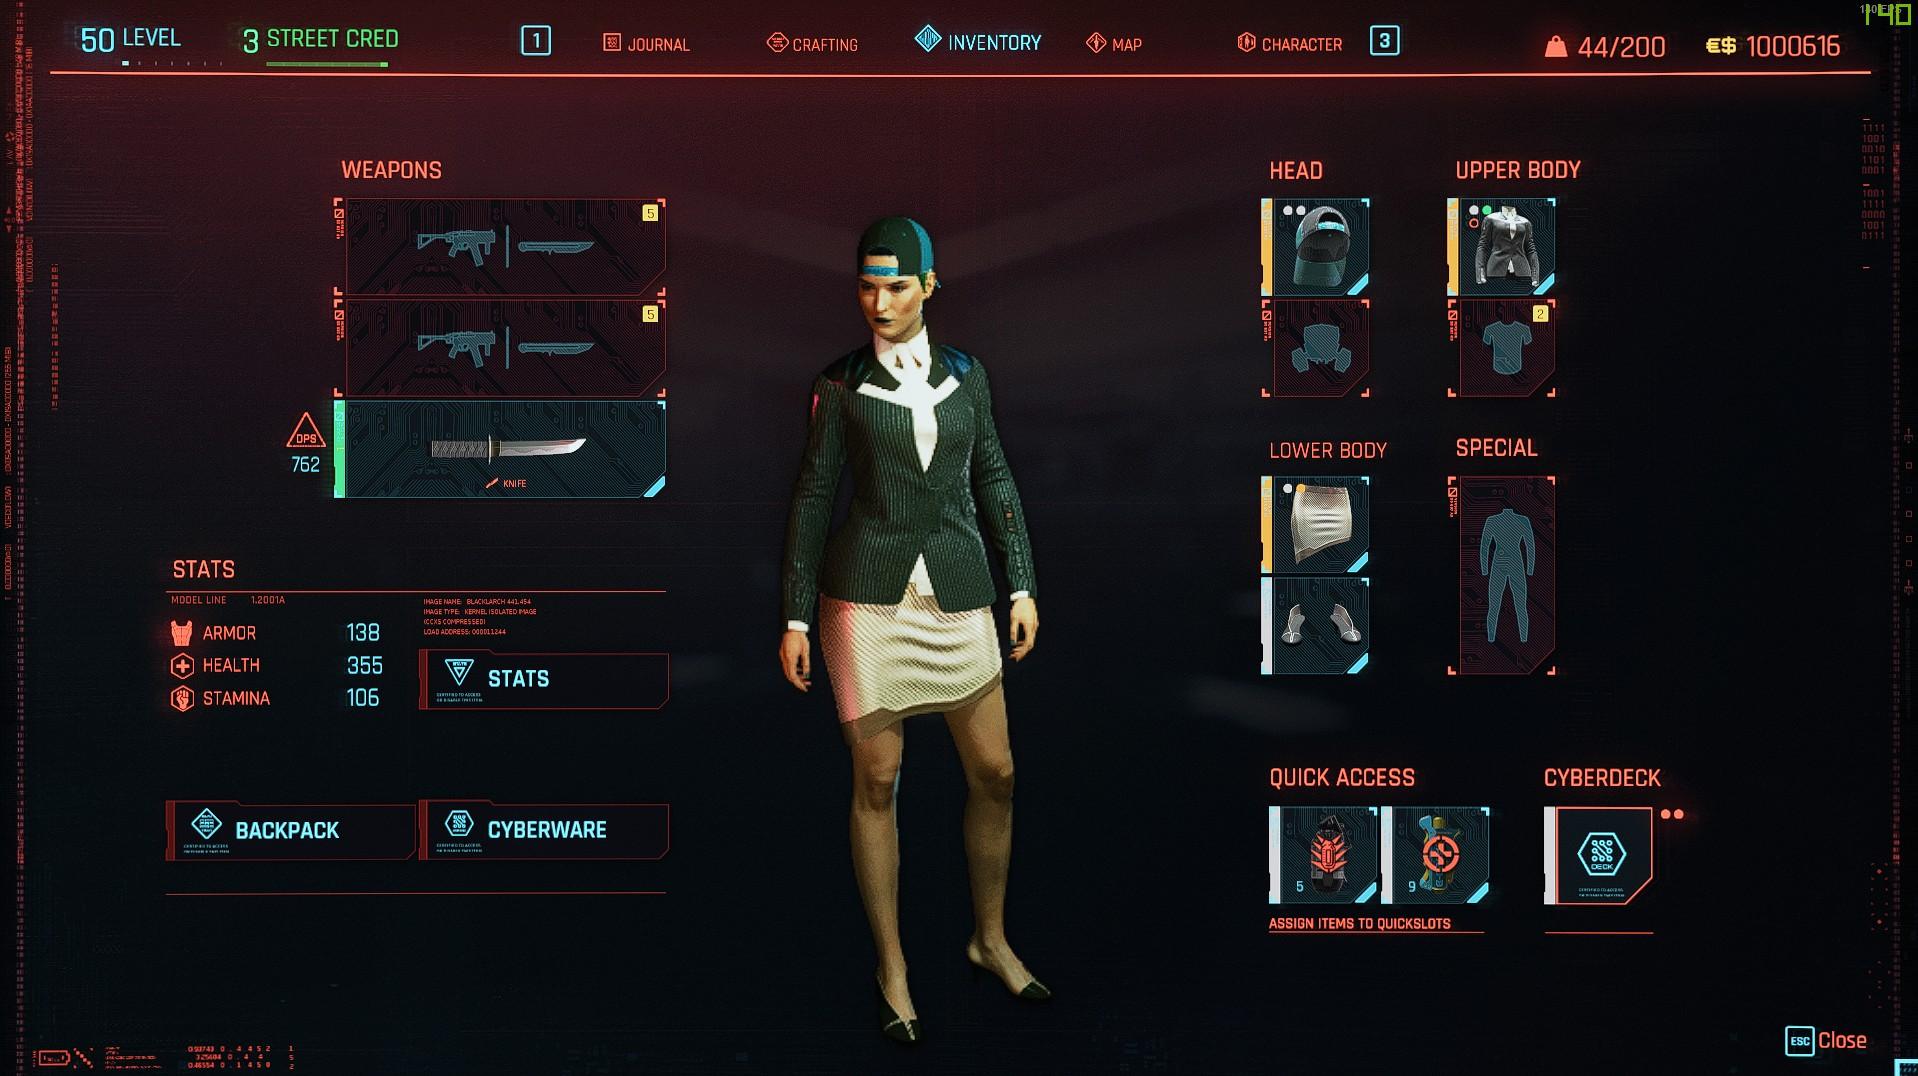 Cyberpunk 2077: Corpo level 50